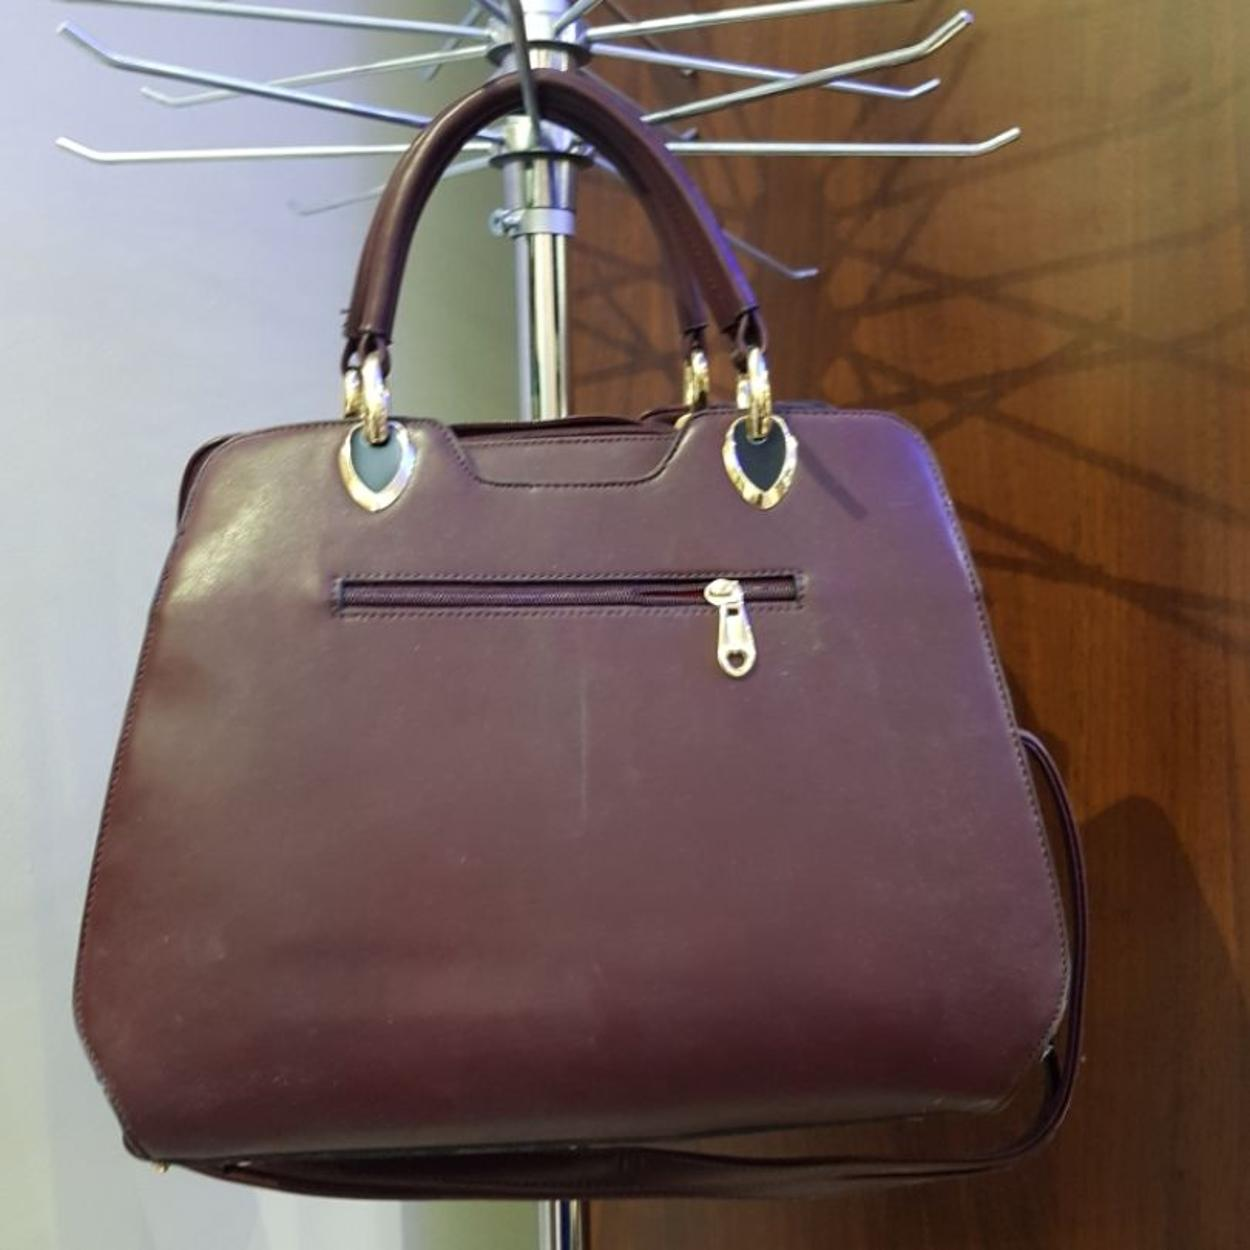 DSN Kol çantası